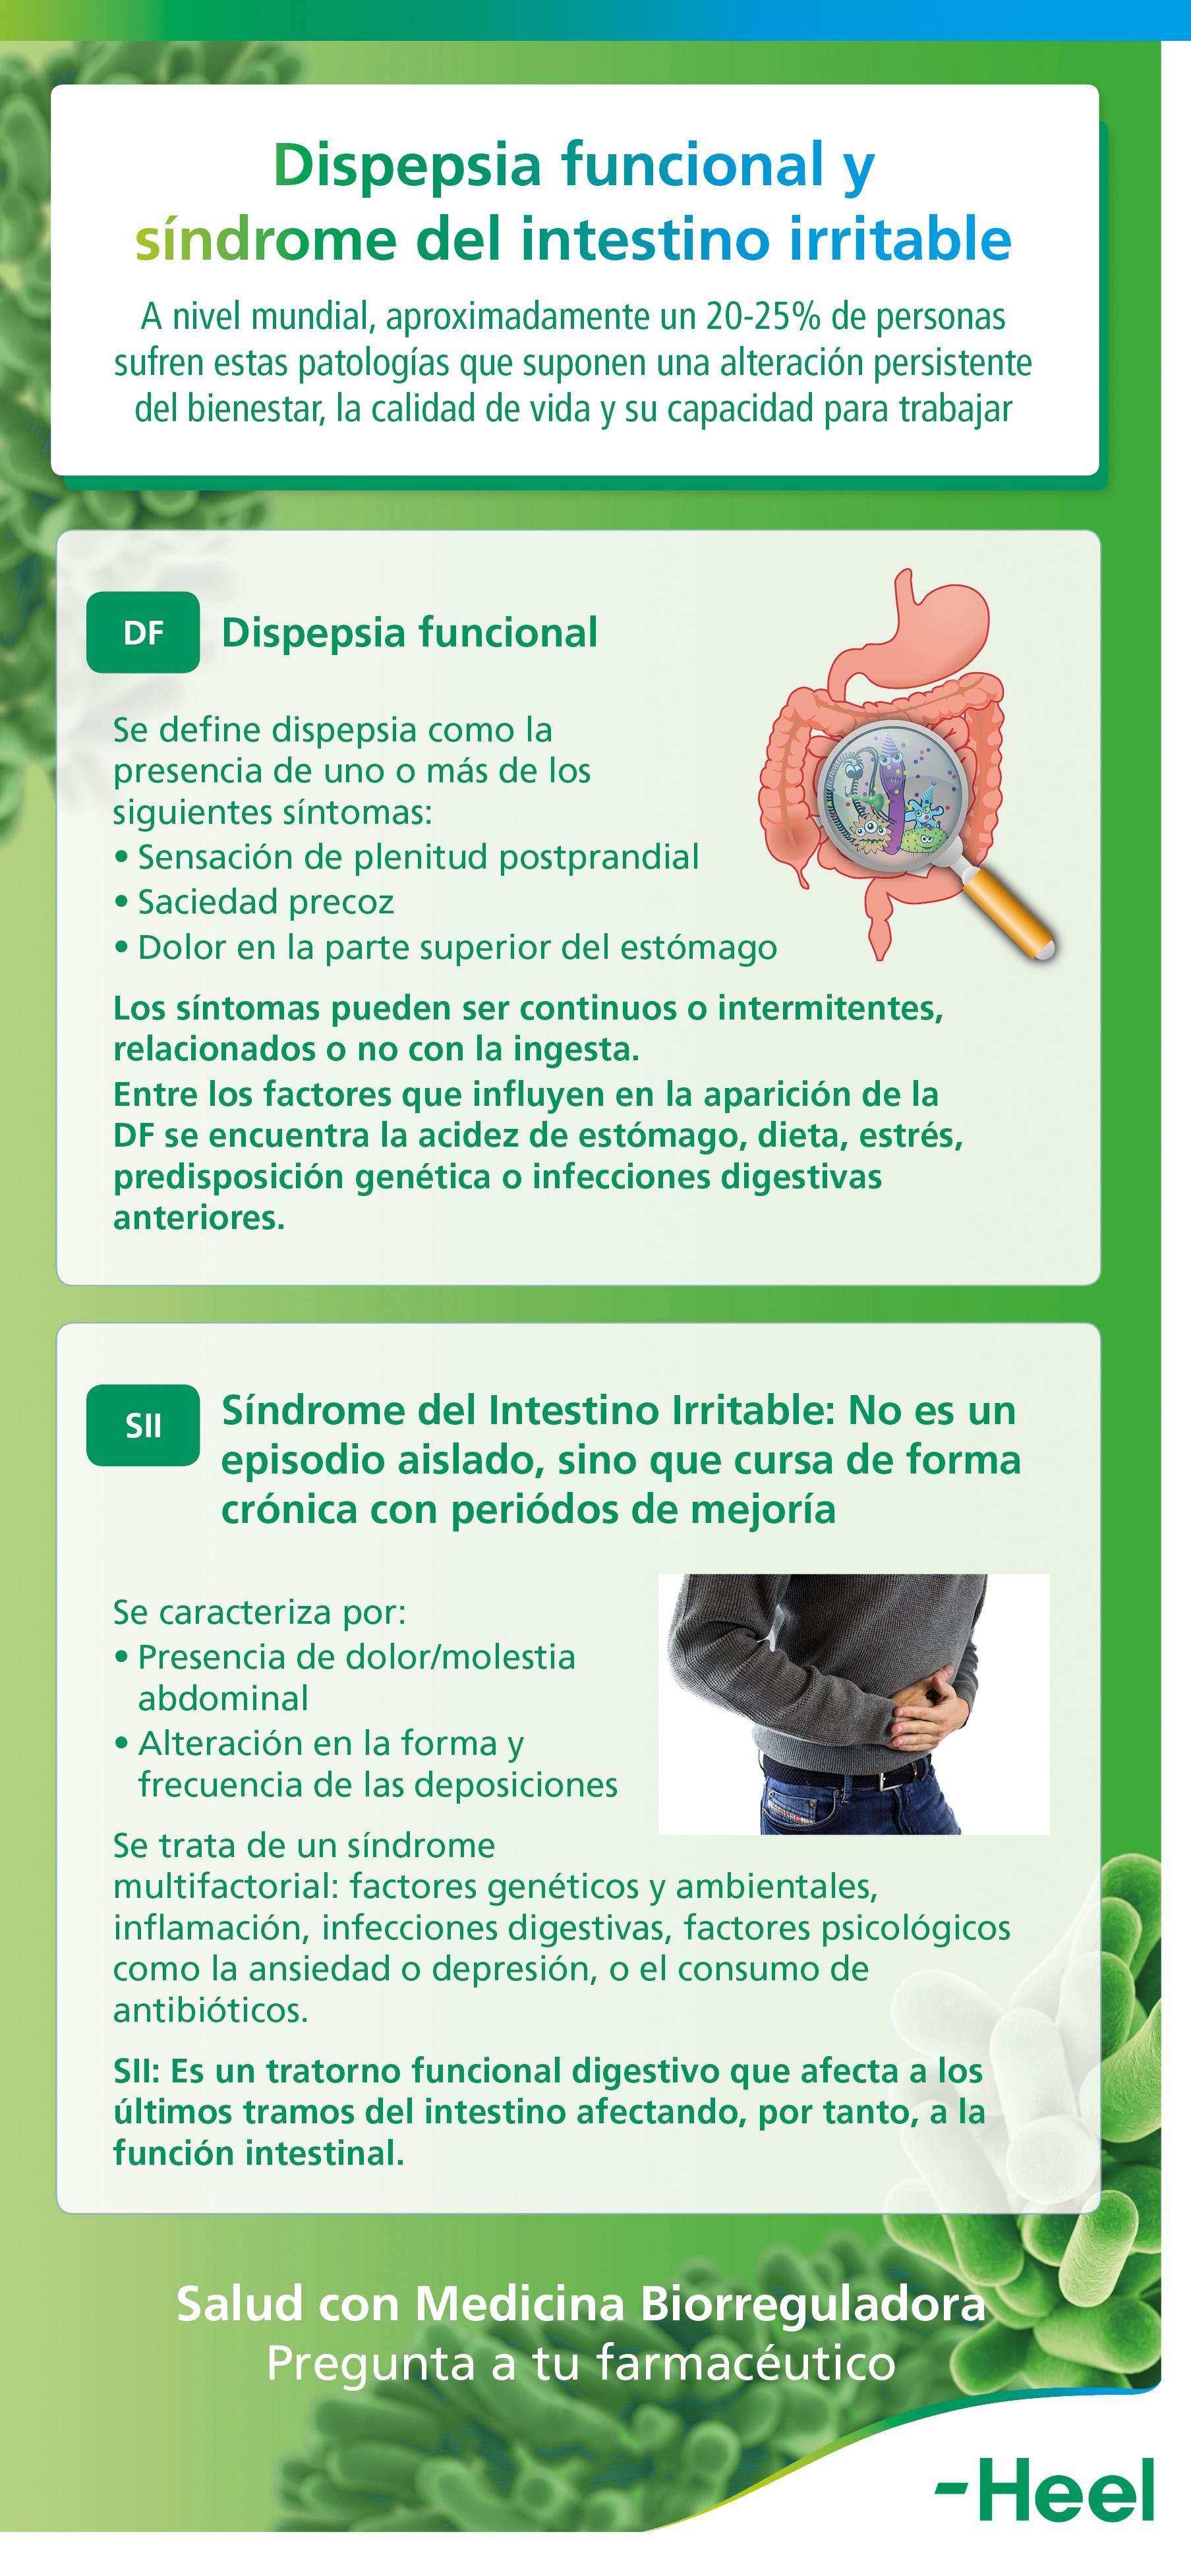 dispepsia-funcional-intestino-irritable